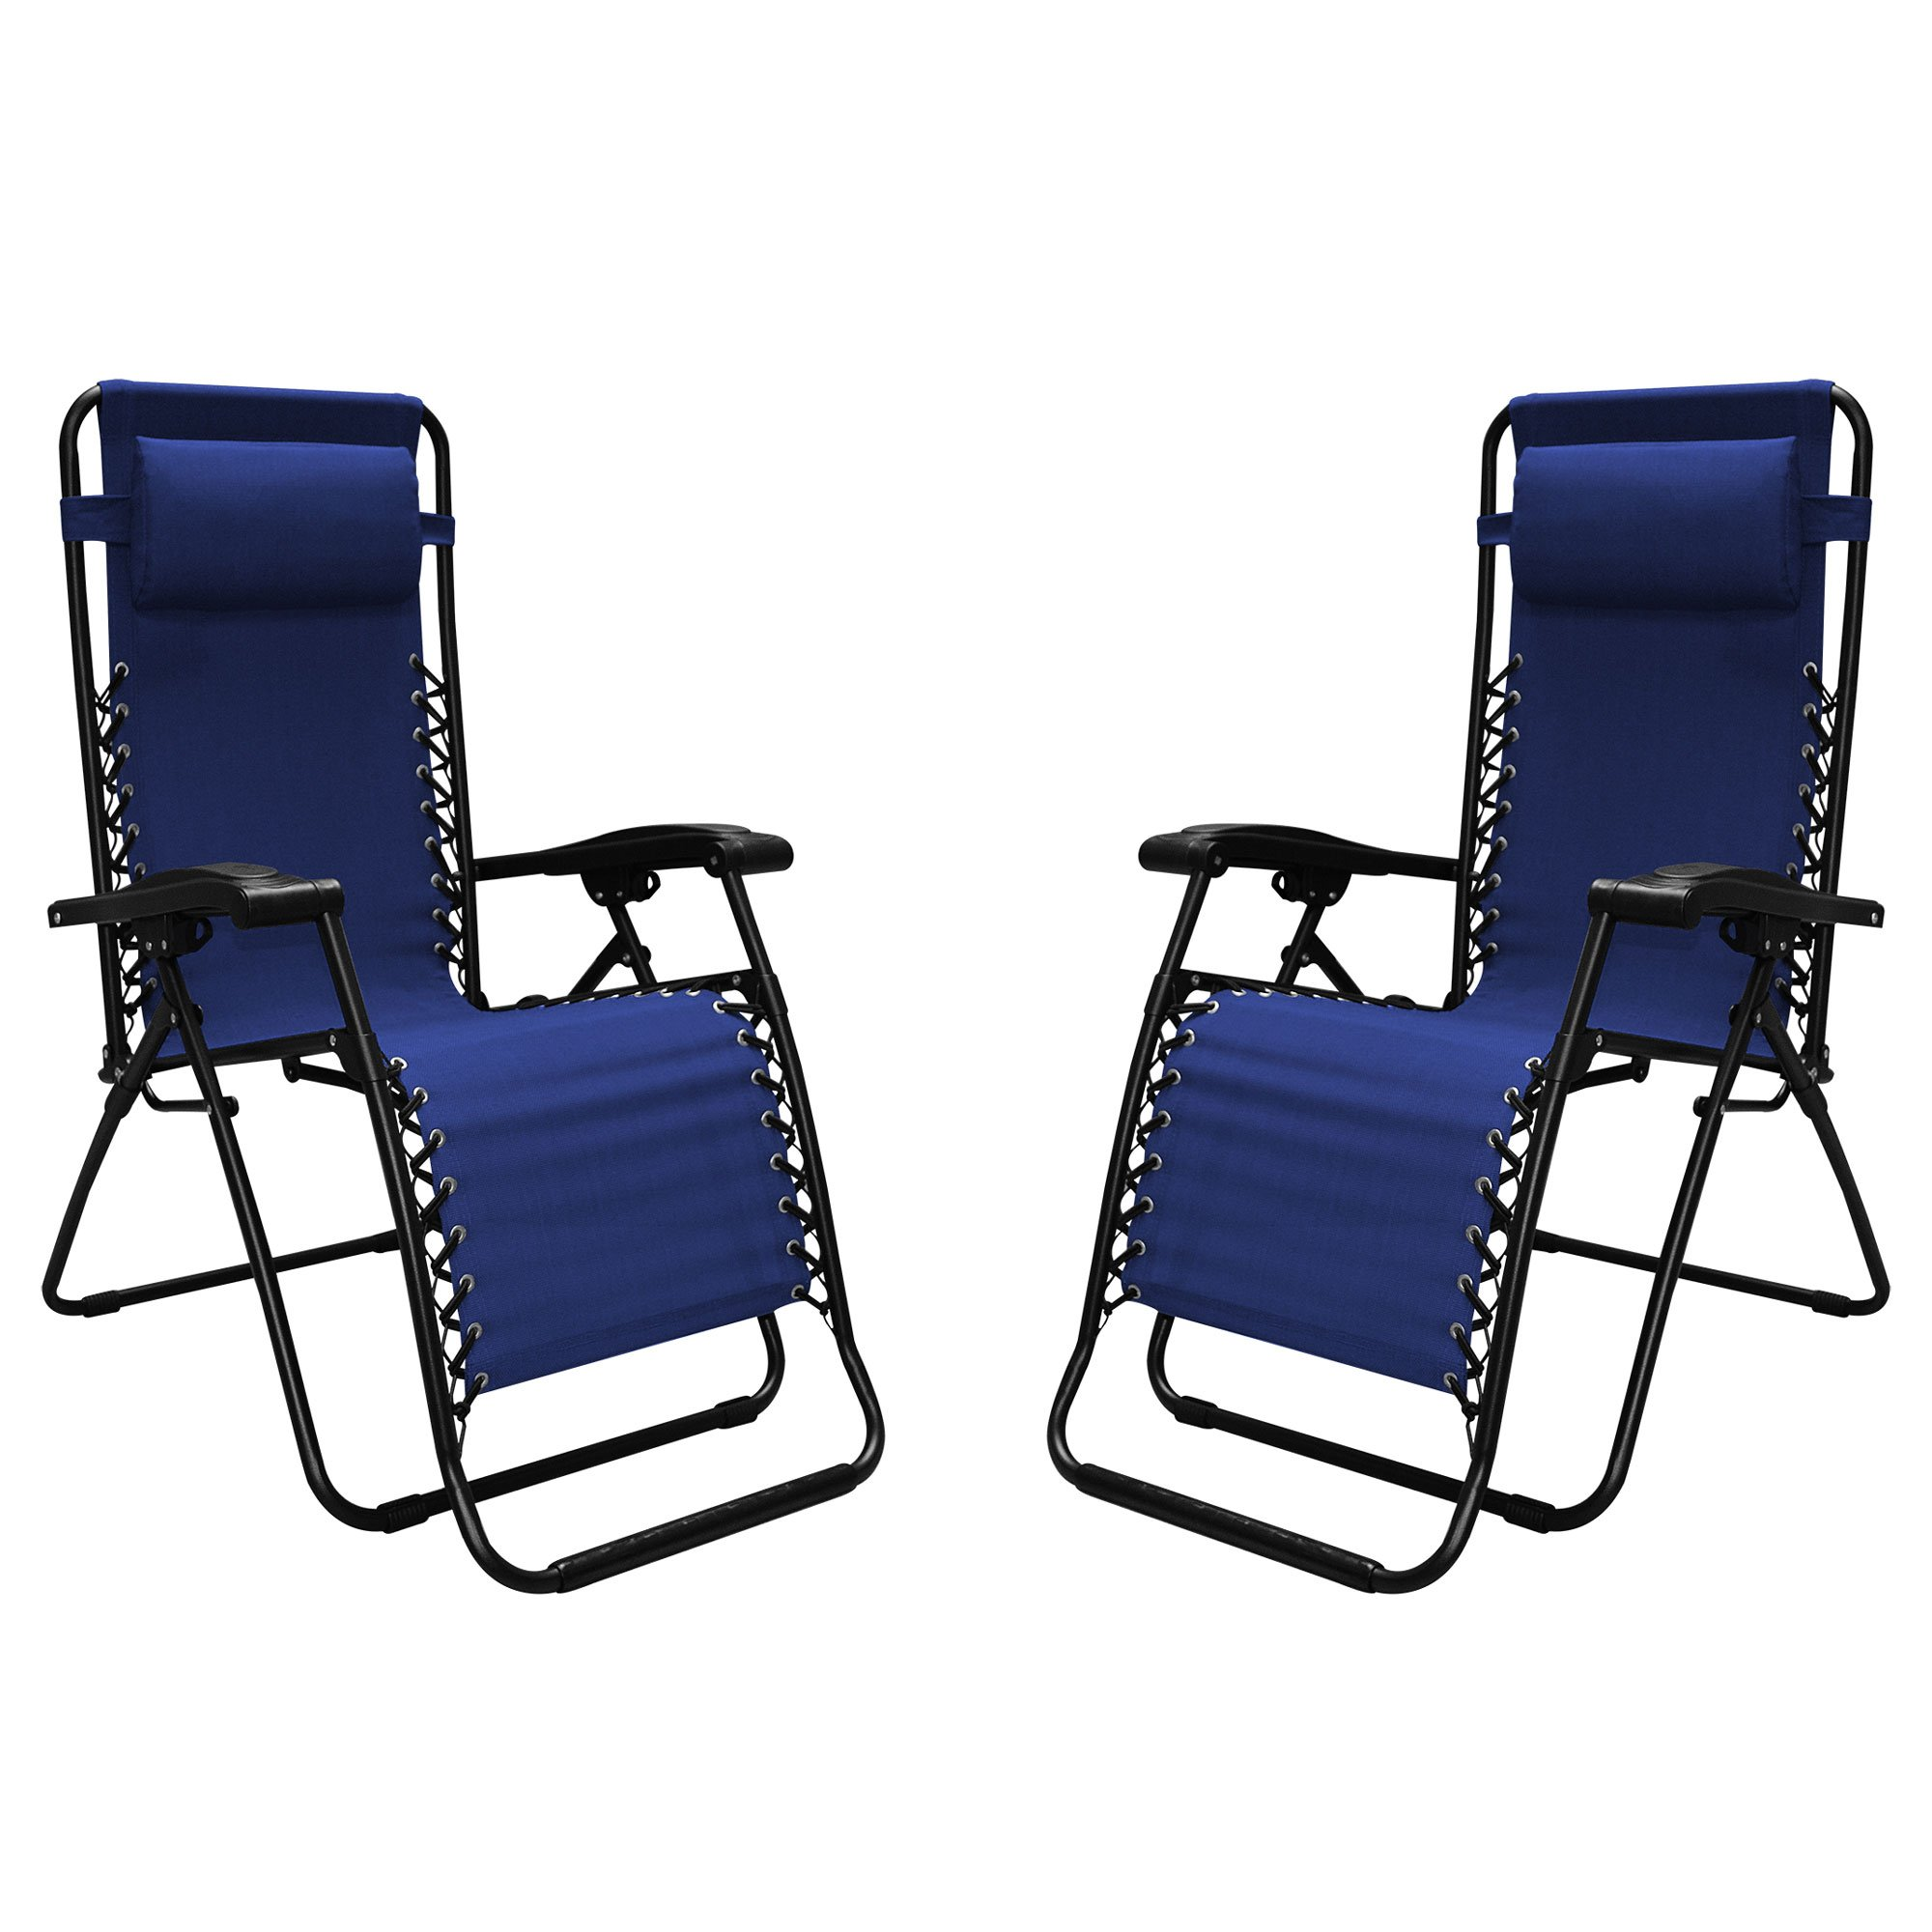 Caravan Sports Infinity Zero Gravity Chair - 2 Pack, Blue